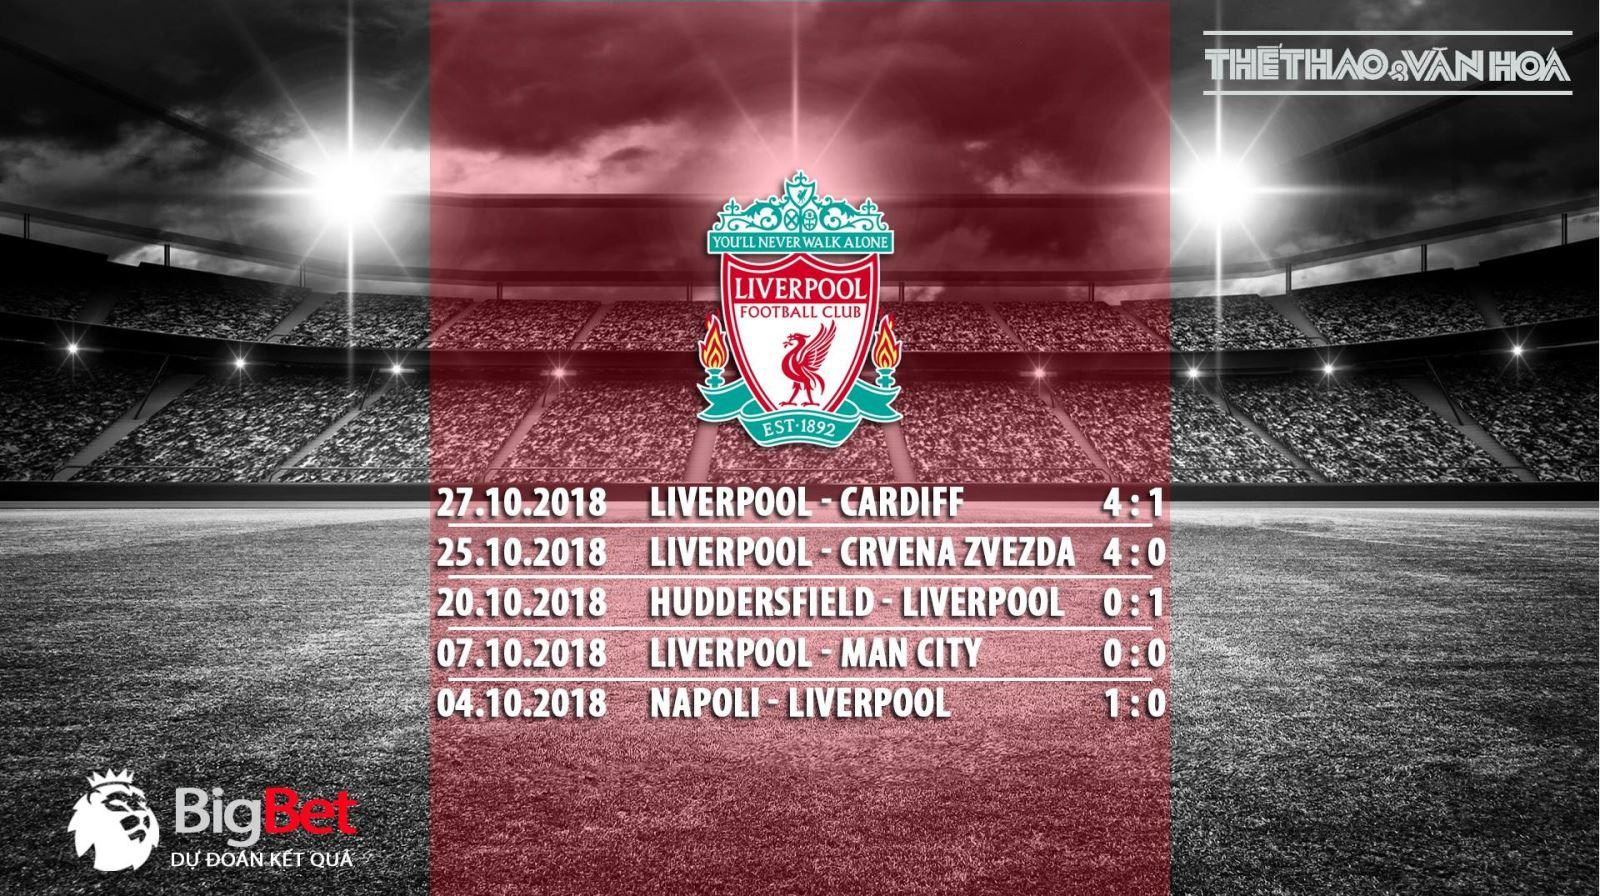 nhận định liverpool vs arsenal, nhận định arsenal vs liverpool, dự đoán arsenal vs liverpool, dự đoán bóng đá